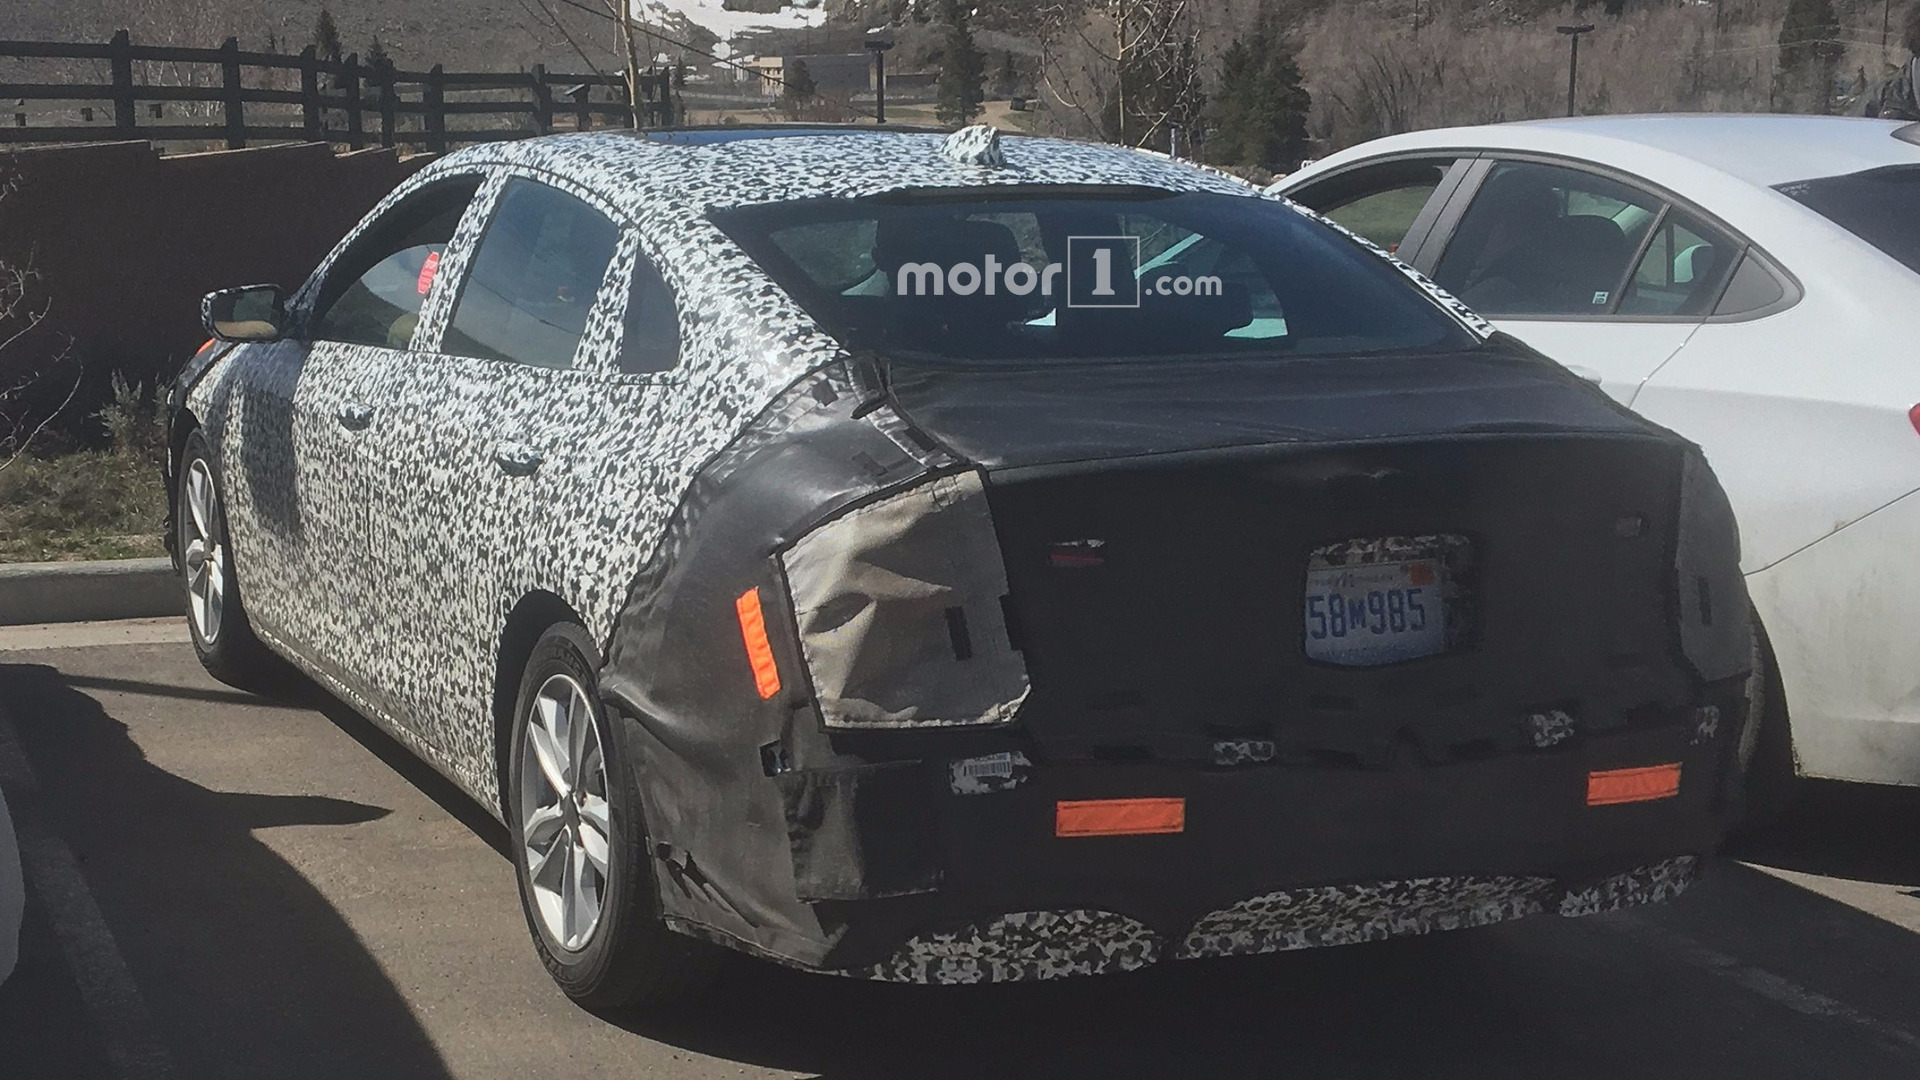 2019 Chevrolet Malibu Price, Interior, Design, Engine, News